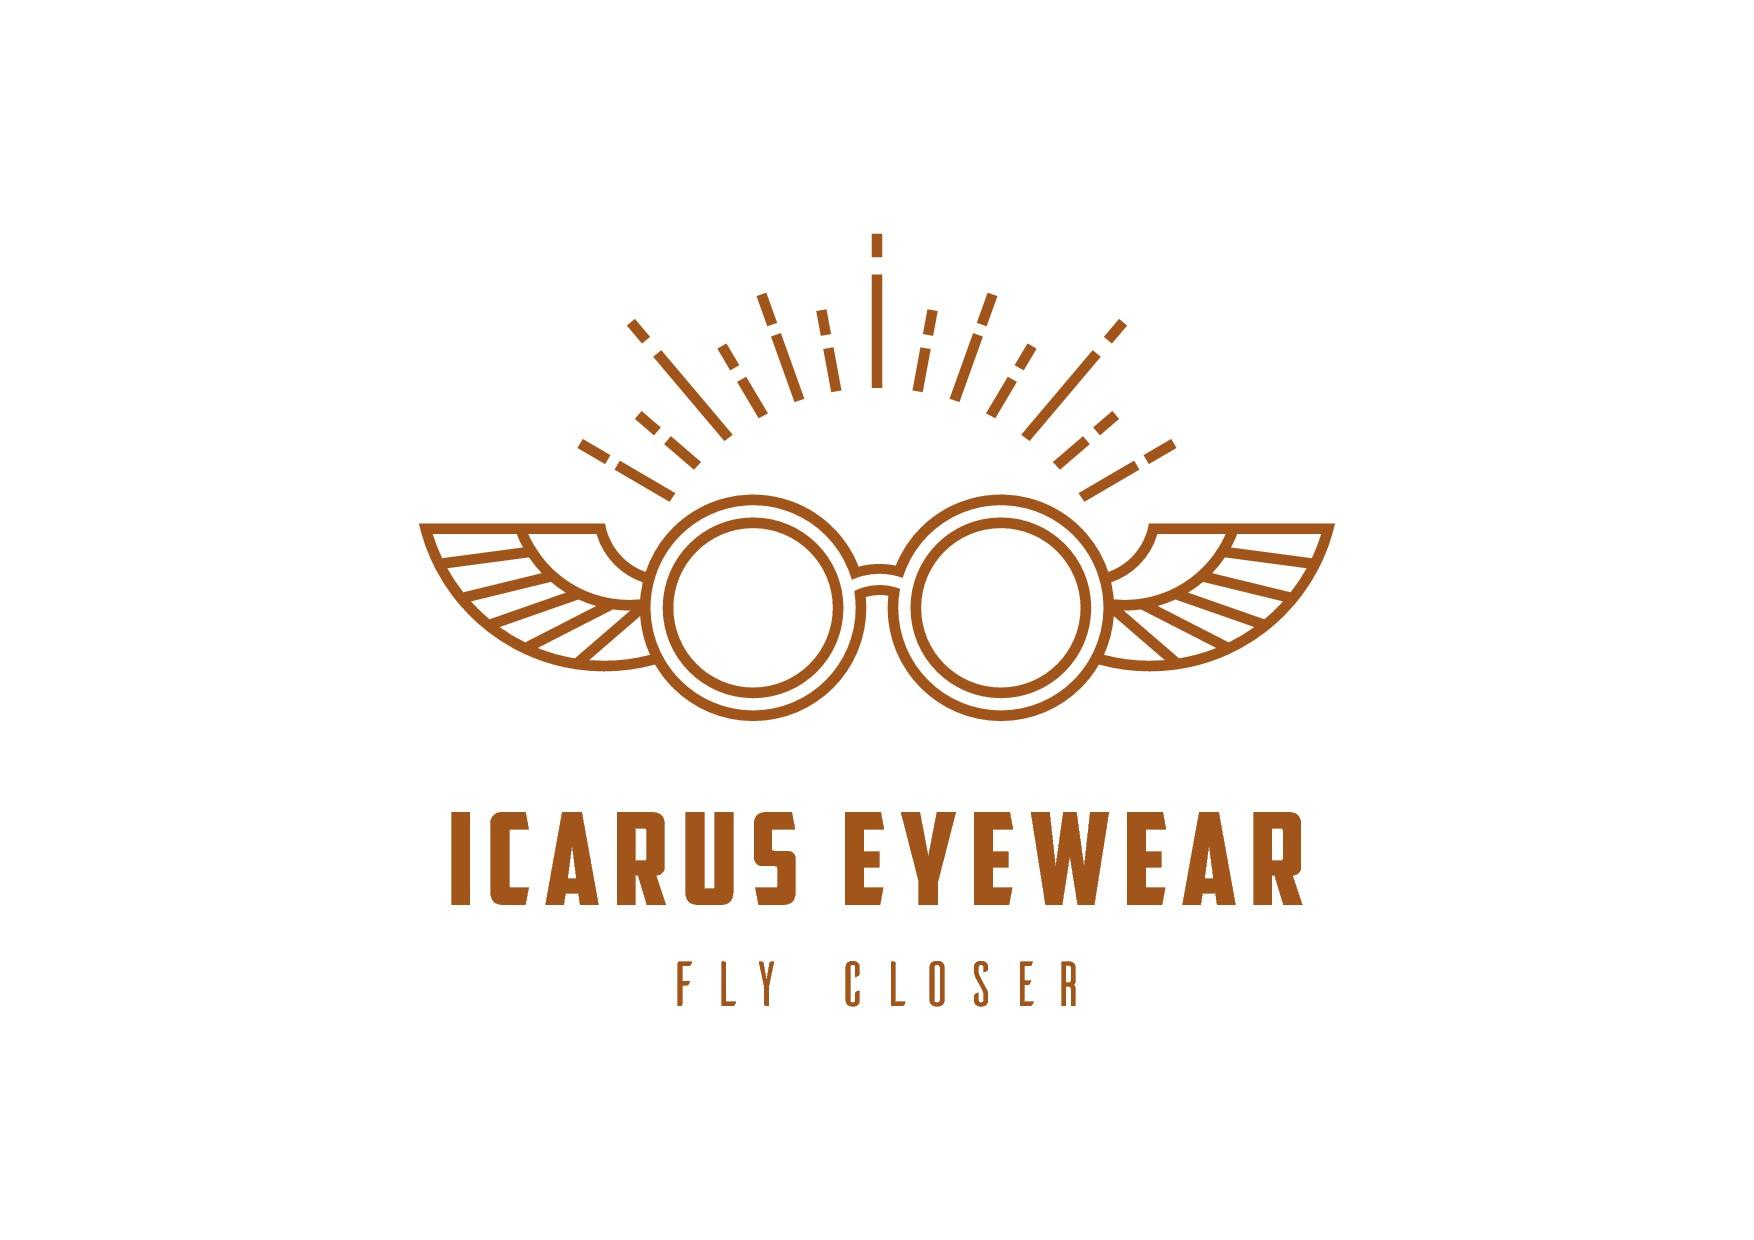 Icarus Eyewear logo design